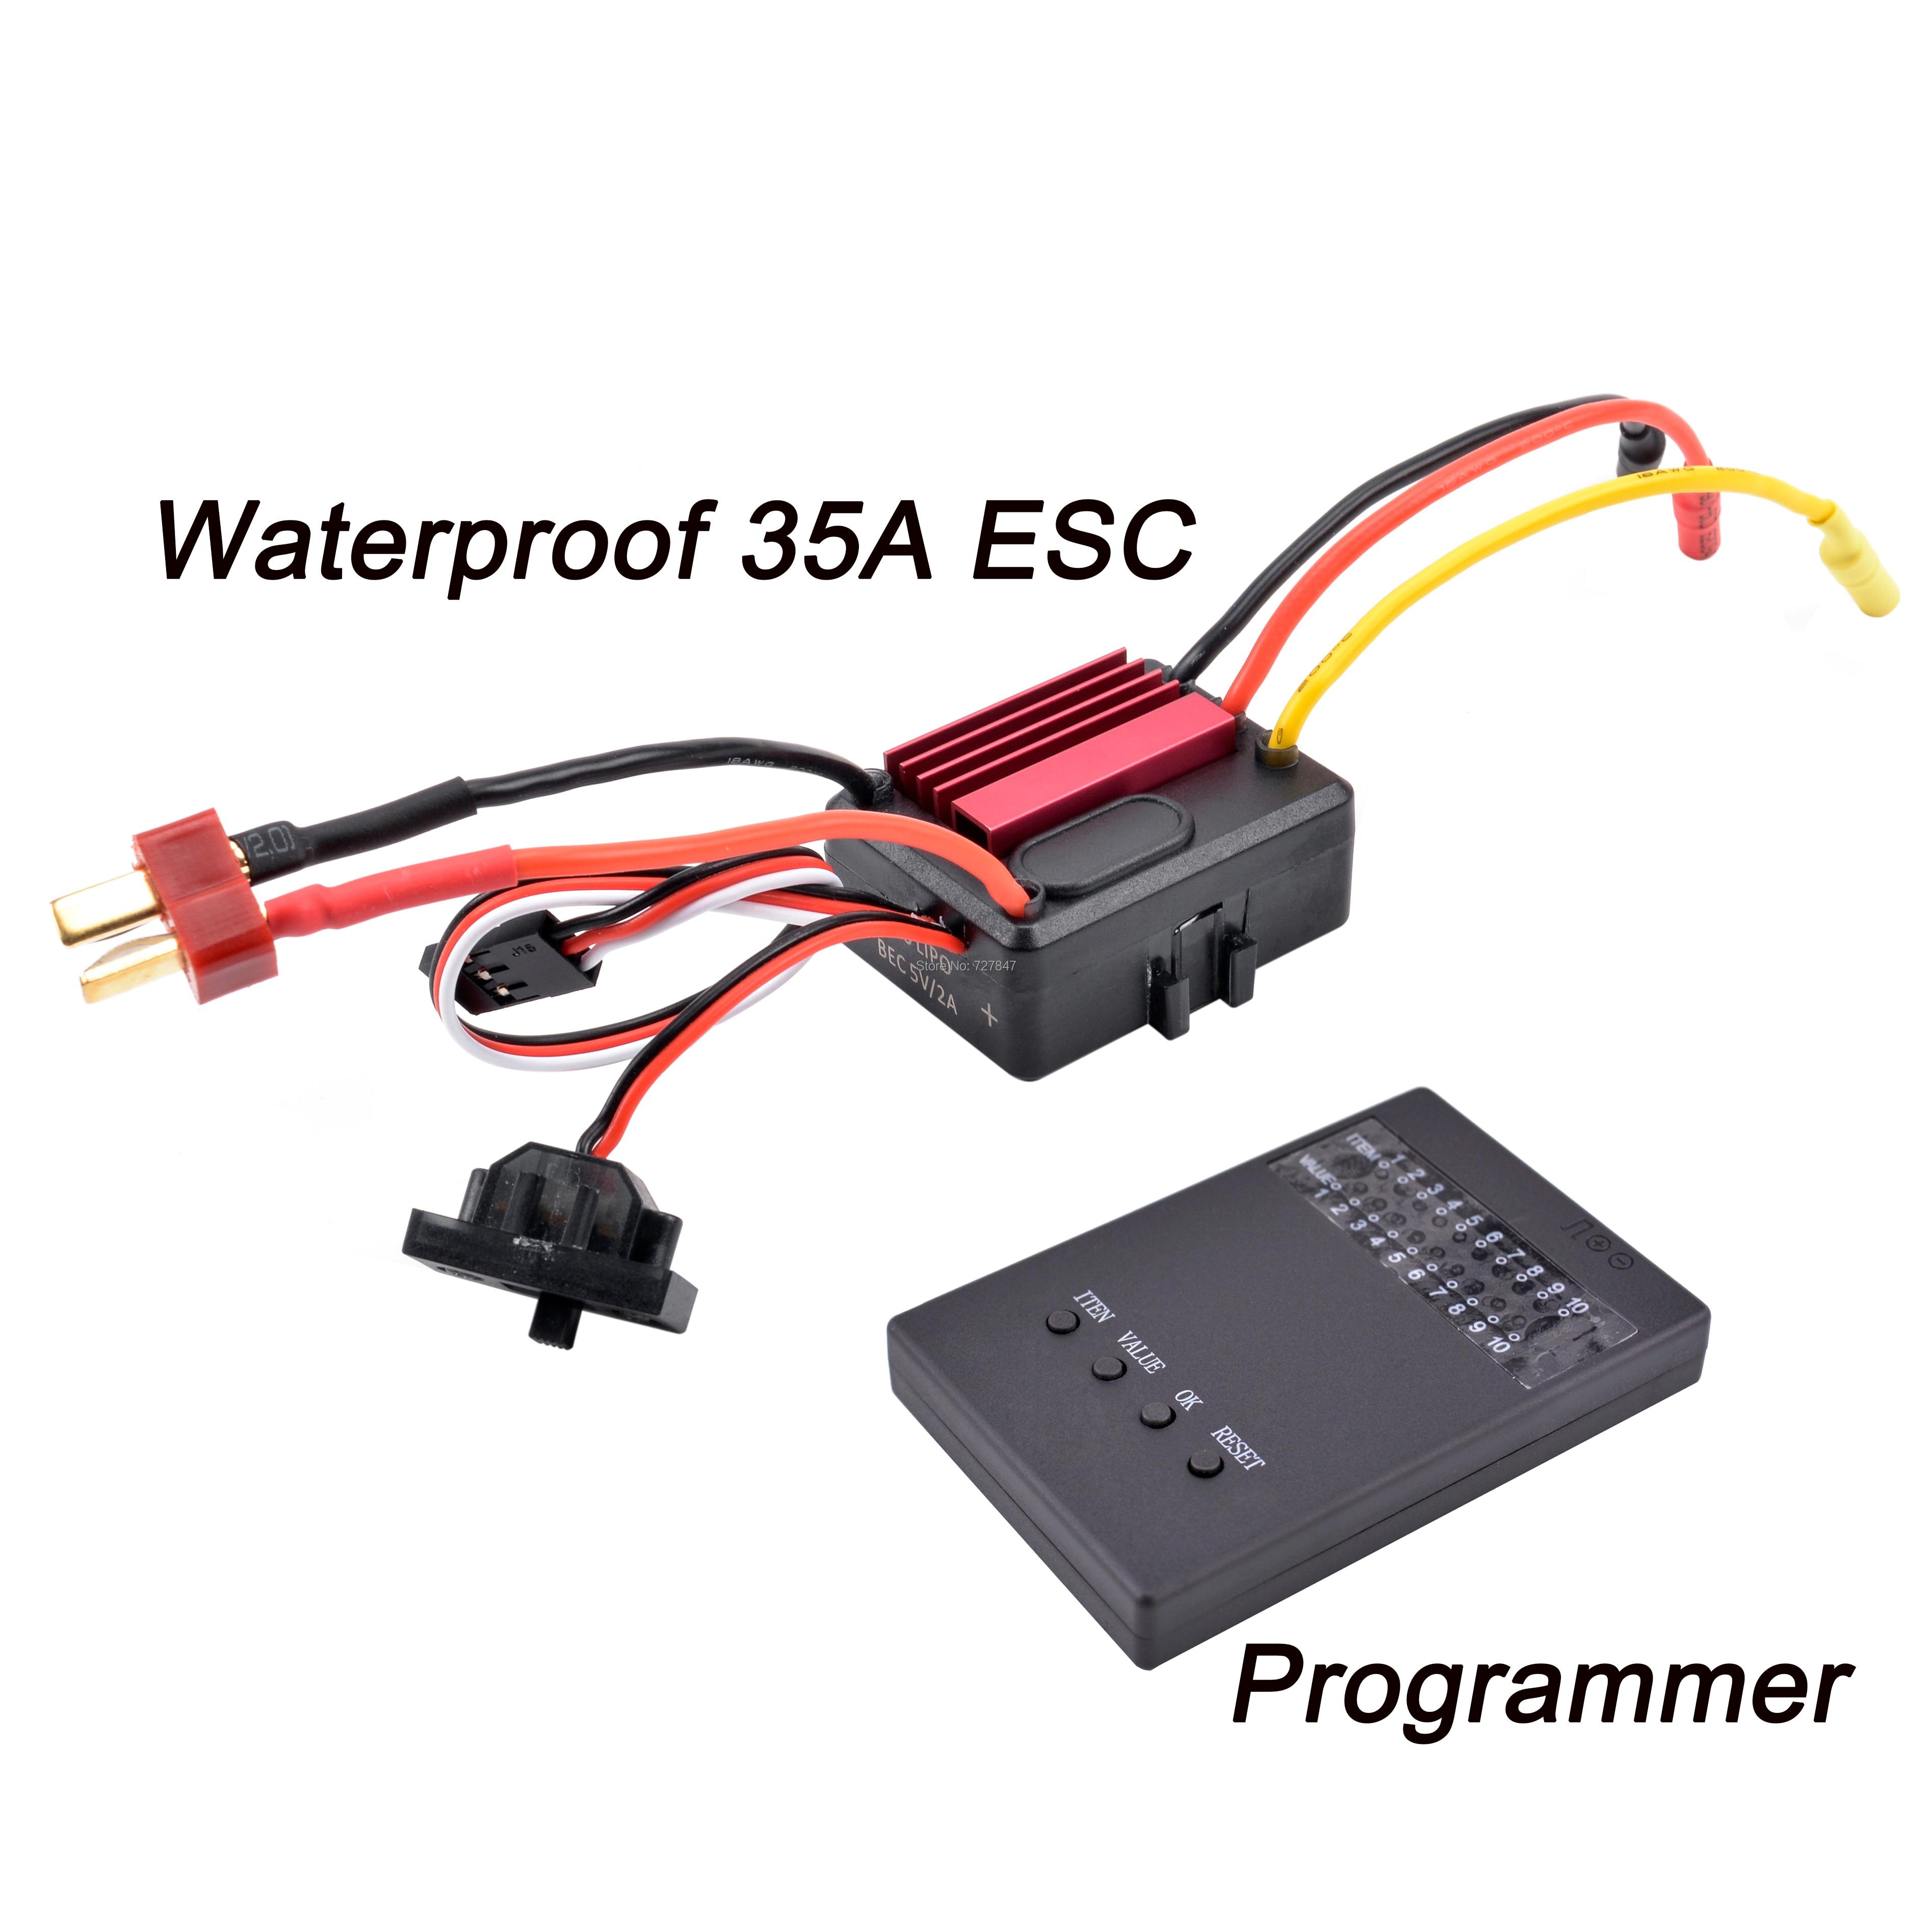 Impermeable 35A 2-3s CES eléctrico CONTROLADOR DE VELOCIDAD DE 5 V/2A BEC de RC 1/14 1/16 1/18 RC coche 2838, 2845 Motor sin escobillas